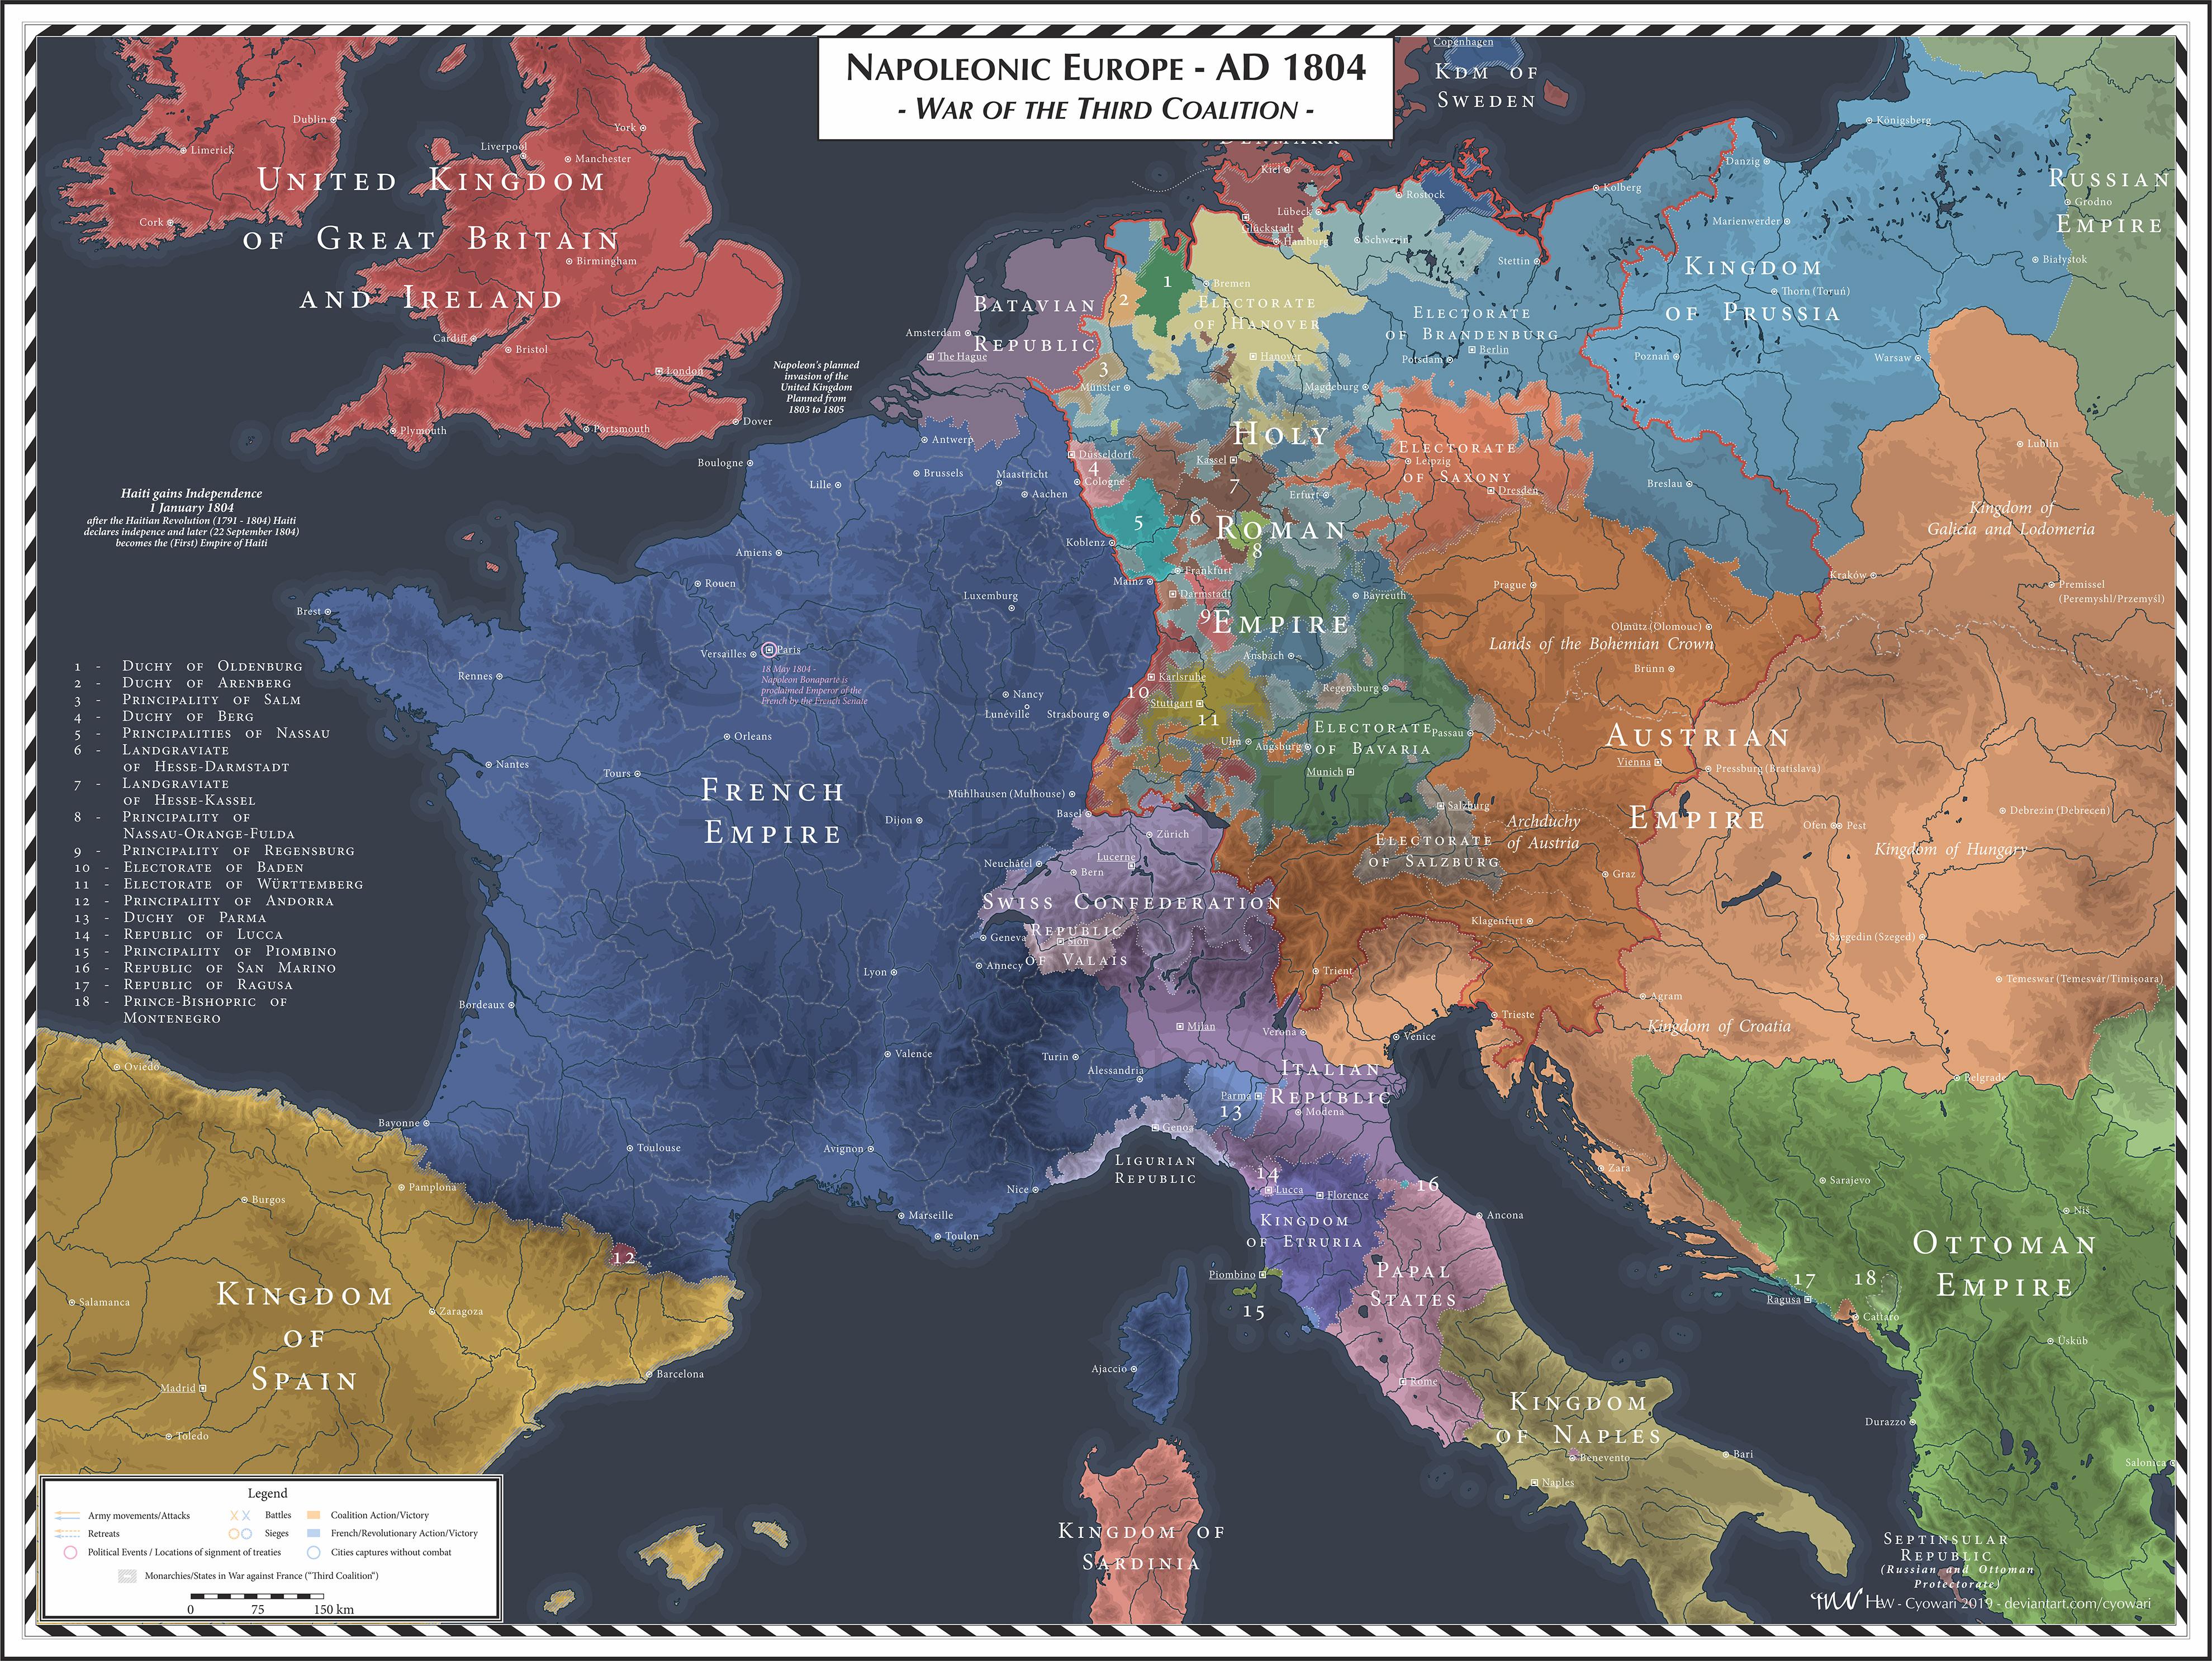 Napoleonic Europe - 1804 - Third Coalition